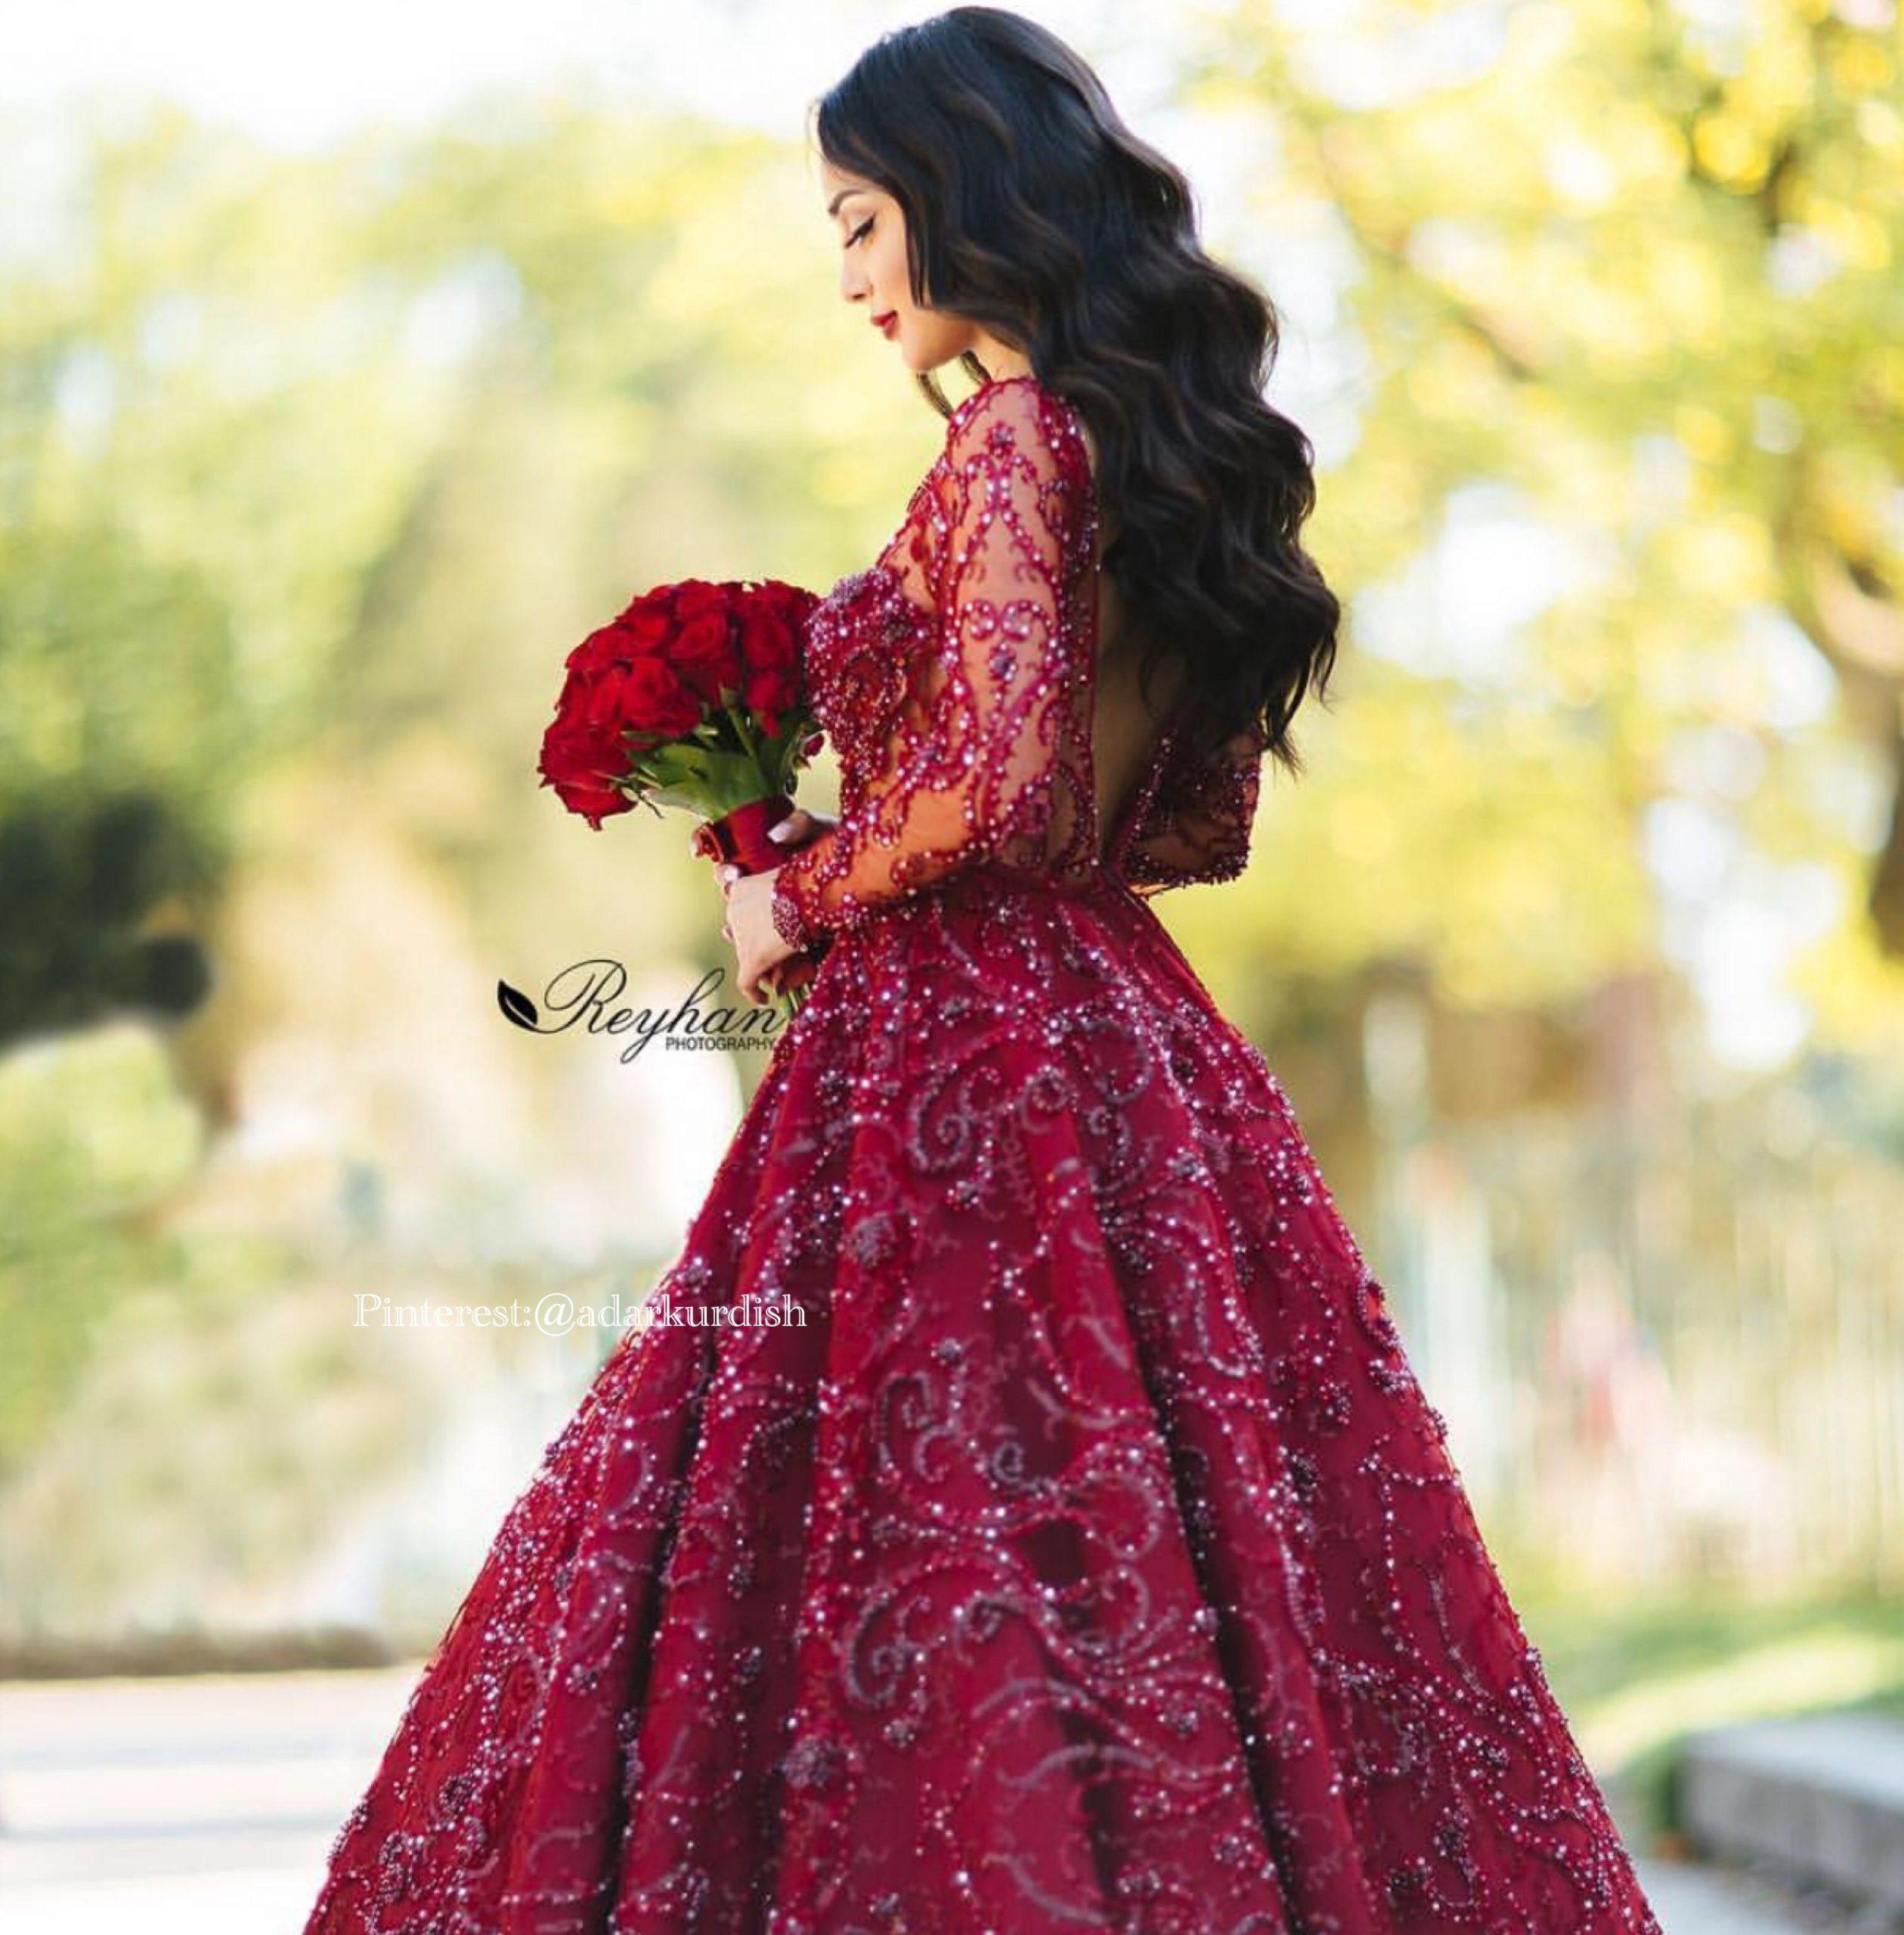 Abend Cool Henna Abend Rotes Kleid Vertrieb Schön Henna Abend Rotes Kleid für 2019